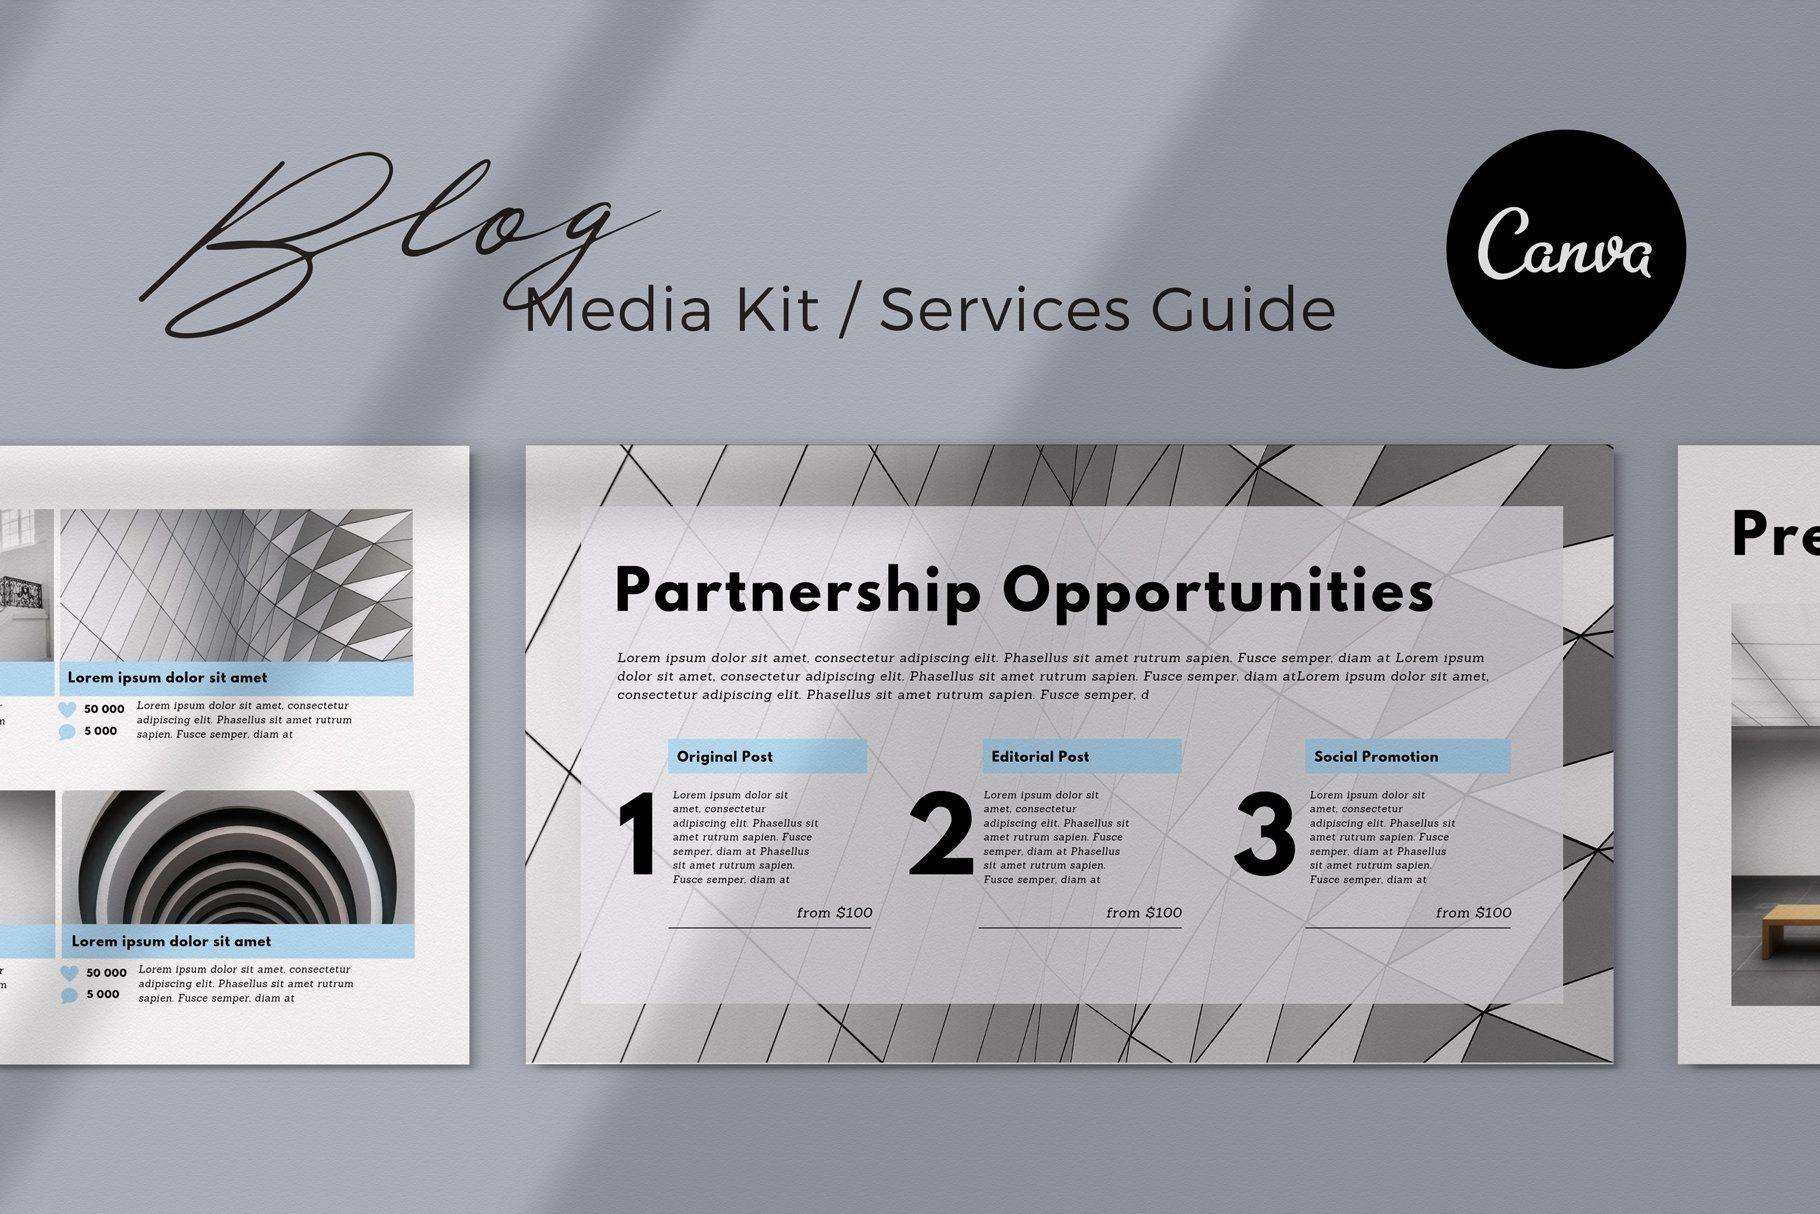 Blogger Media Kit Canva Template Blogger media kit